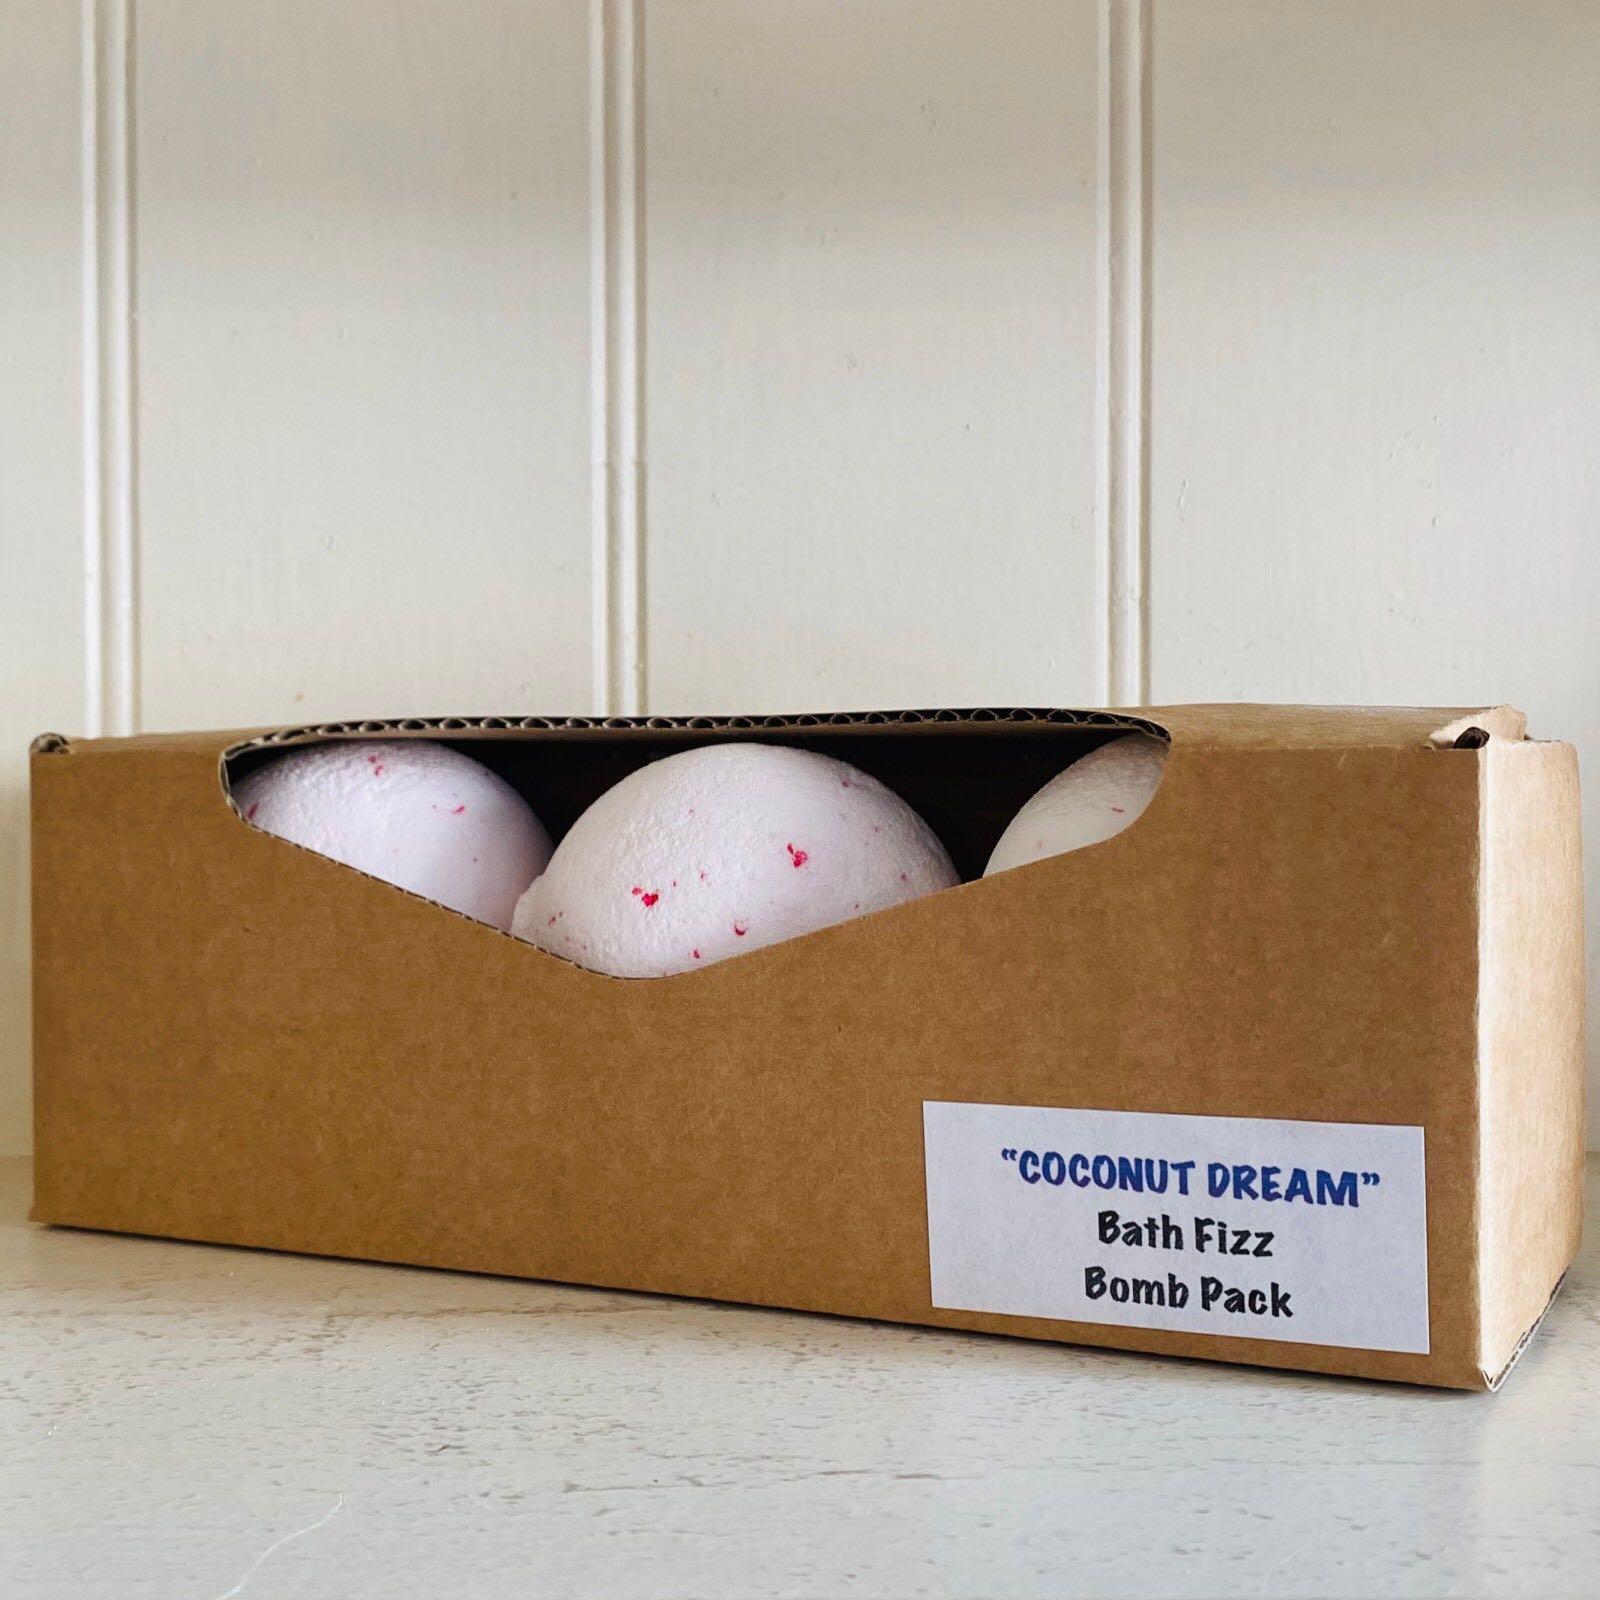 Coconut Dream Bath Fizz Bomb Pack